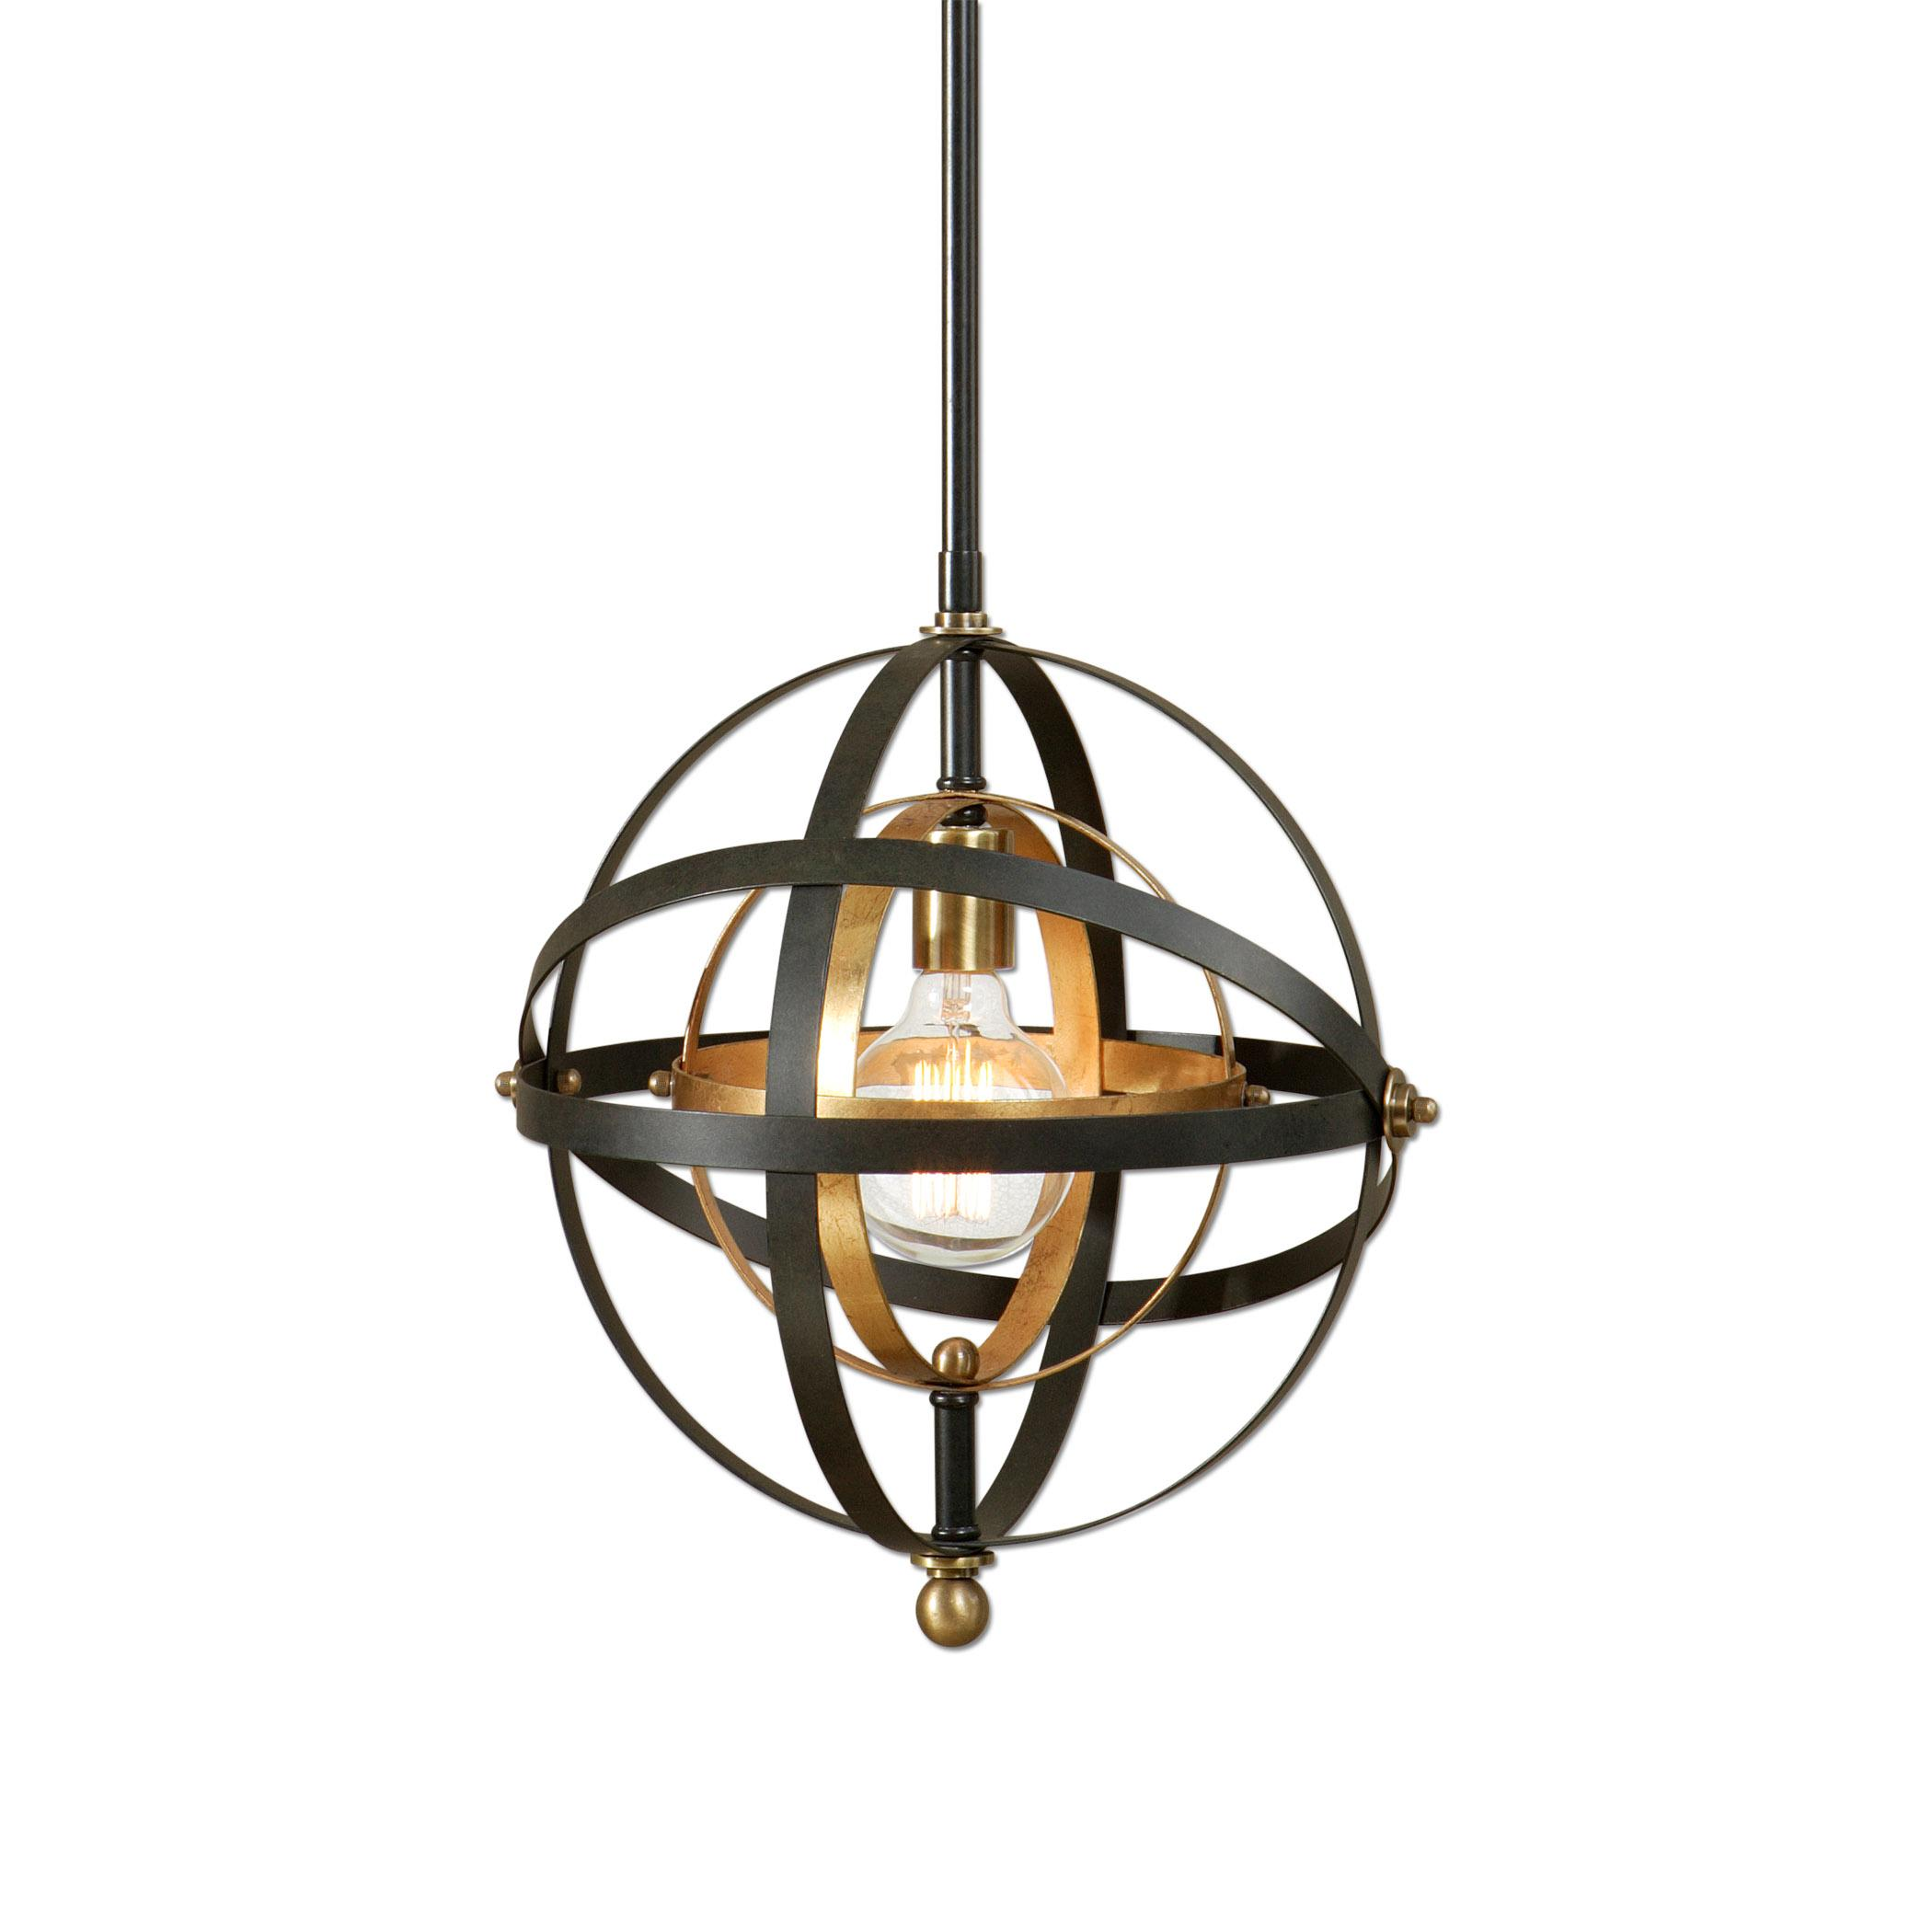 Lighting Fixtures - Pendant Lights Rondure 1 Light Sphere Mini Pendant by Uttermost at Suburban Furniture